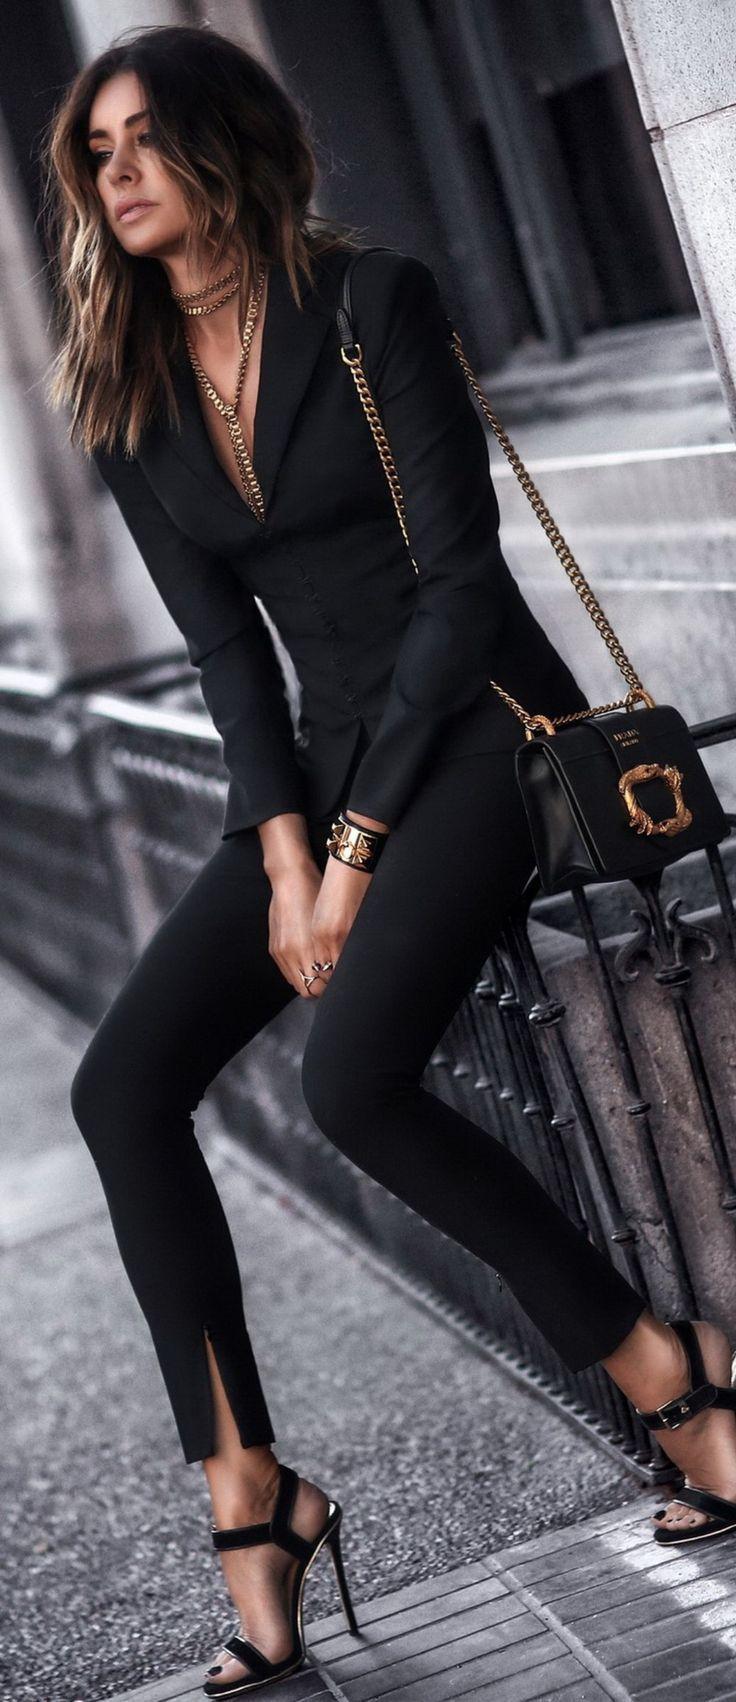 Blazer: La Perla also love this Leather version Pants: La Perla Shirt: La Perla Trench: Marissa Webb Shoes: Strappy Heels – Dsquared2, Booties: Luna Stella